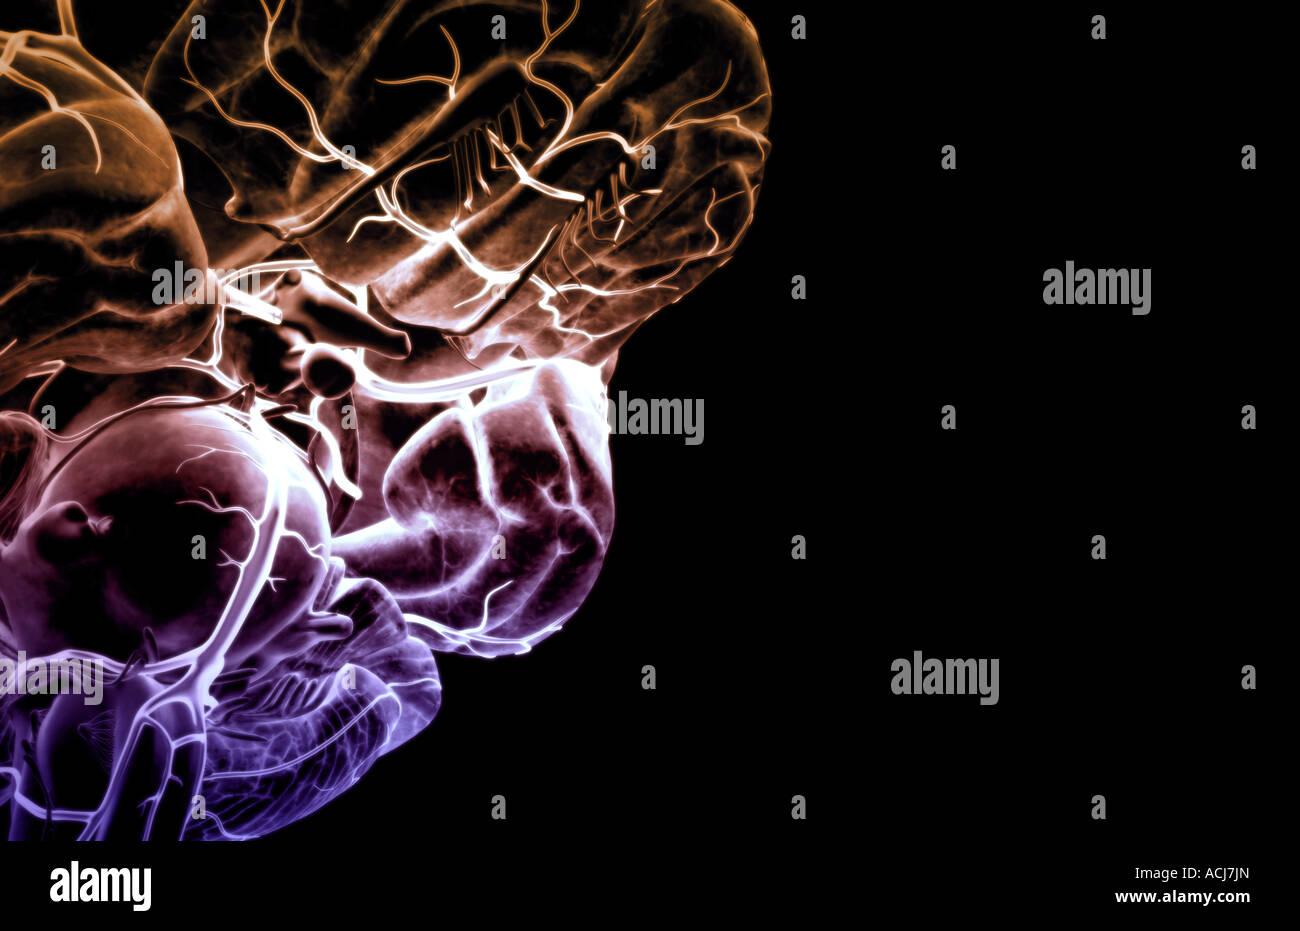 Circulus arteriosus cerebri Stockfoto, Bild: 13167500 - Alamy